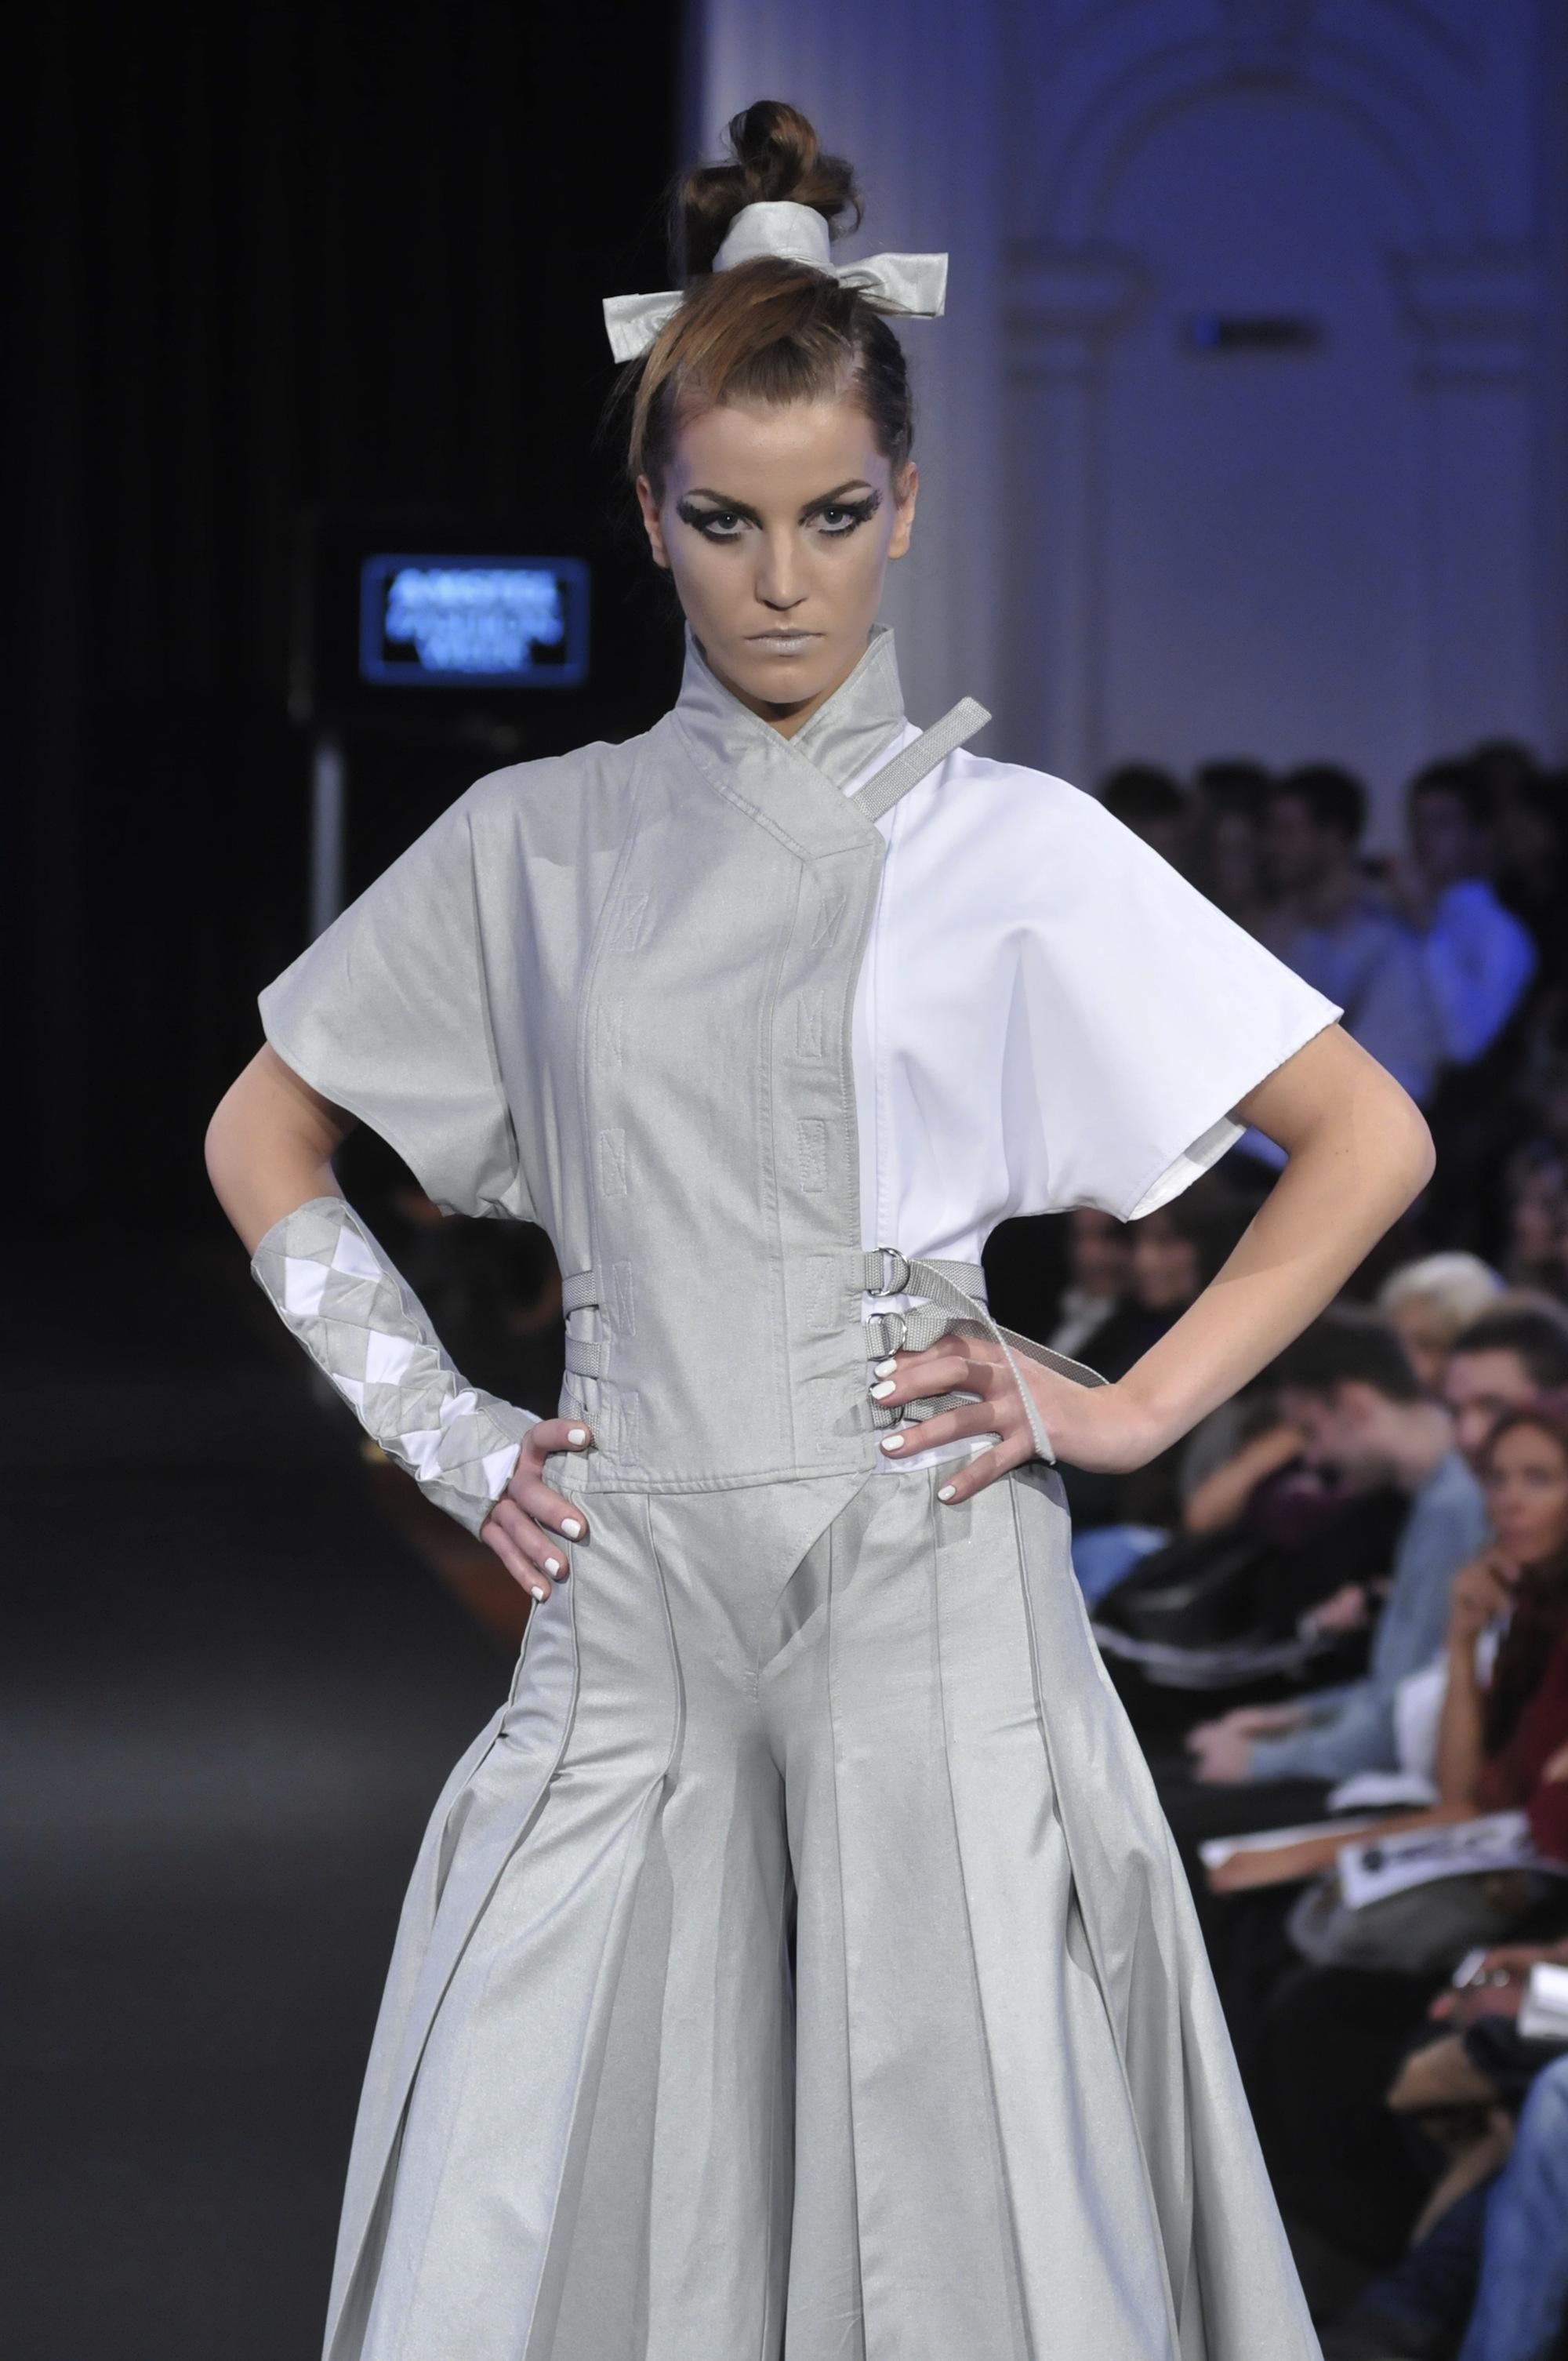 andjela pupovac megatrend 30. Amstel Fashion Week: 2. veče